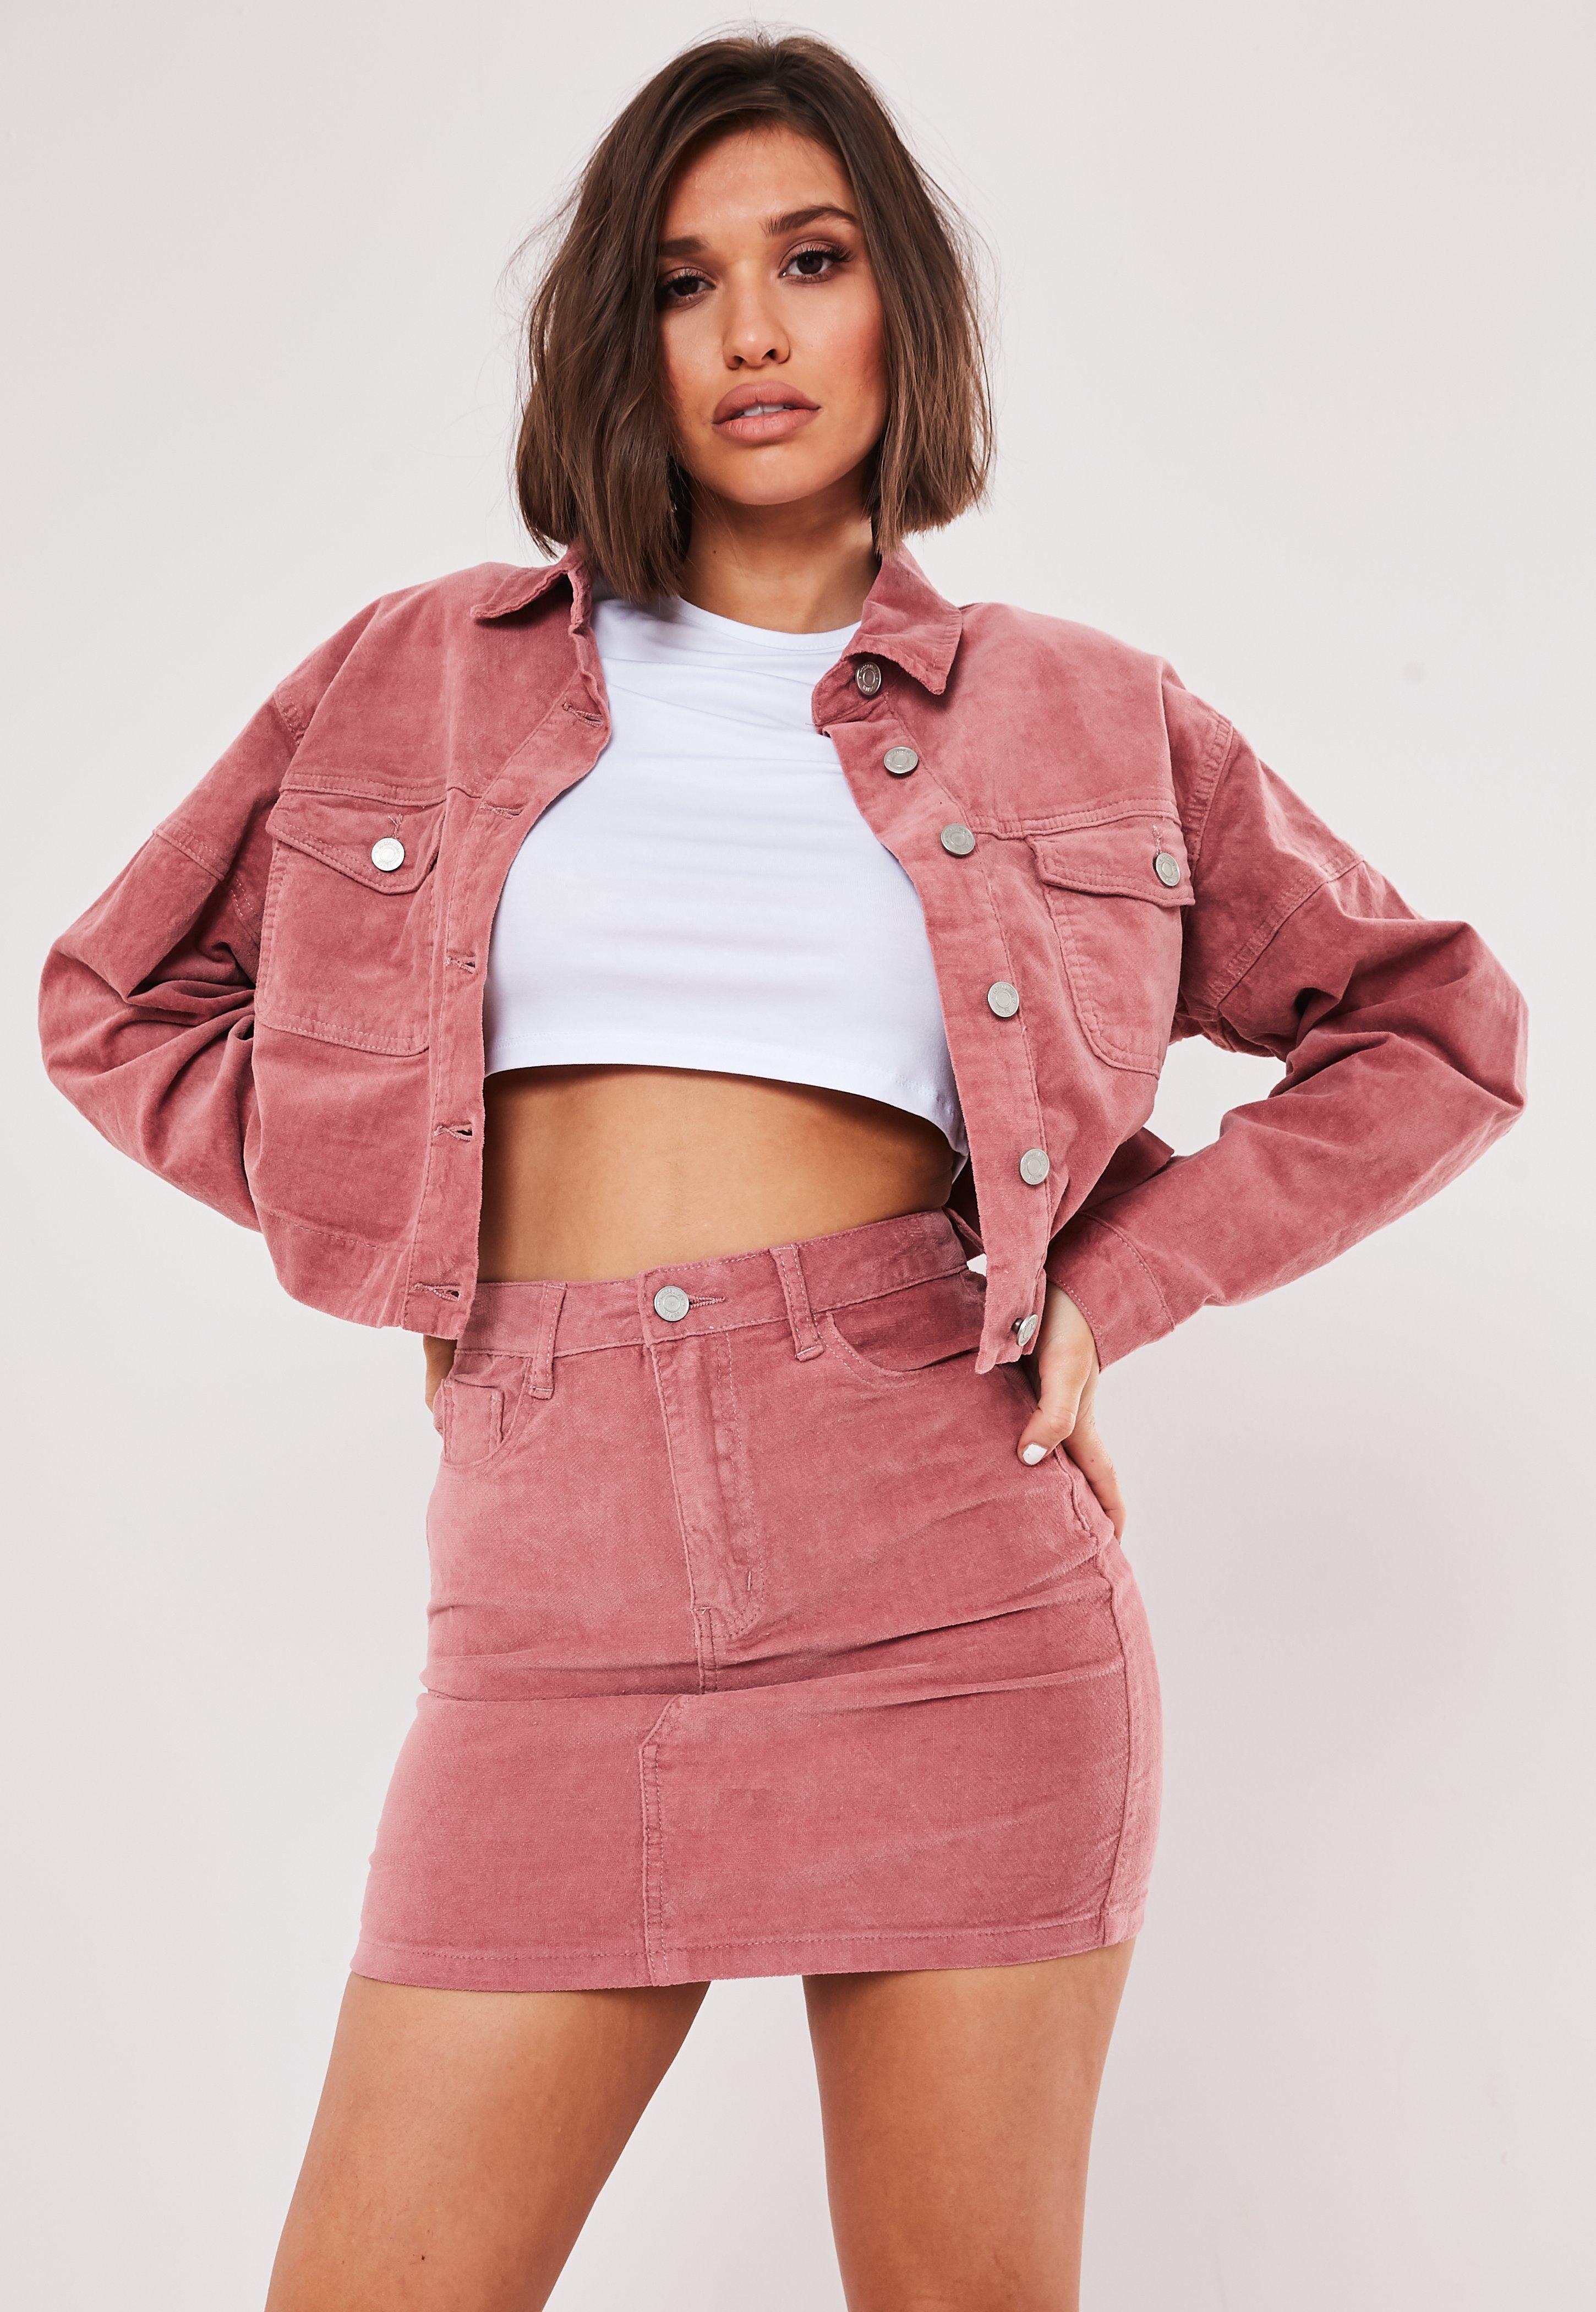 Pink Co Ord Velvet A Line Mini Skirt by Missguided